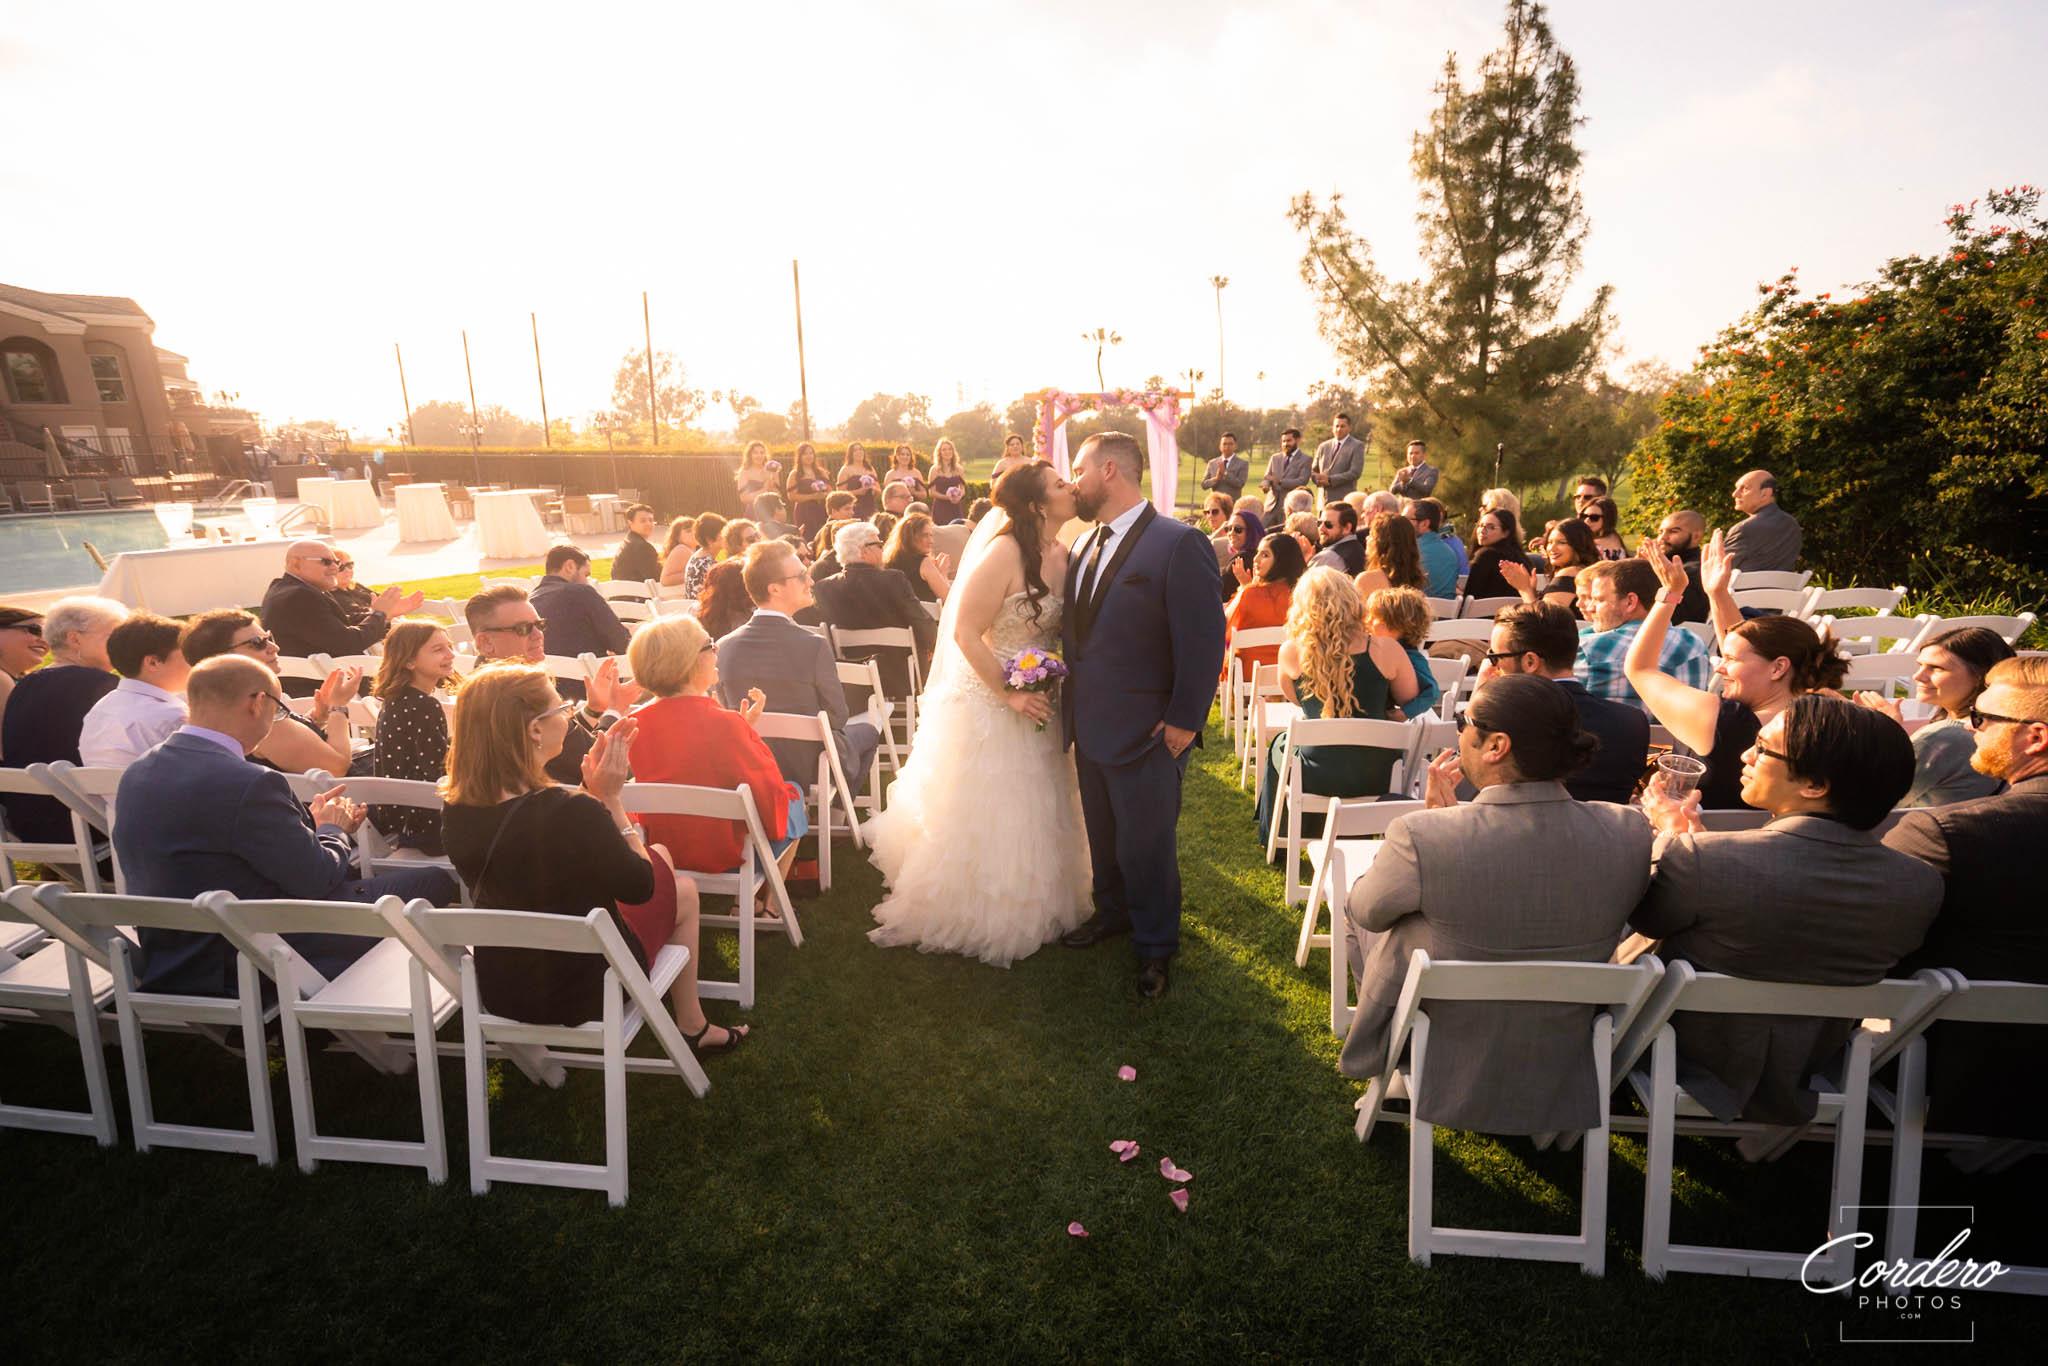 Matt-and-Joana-Wedding-WEB-04925.jpg